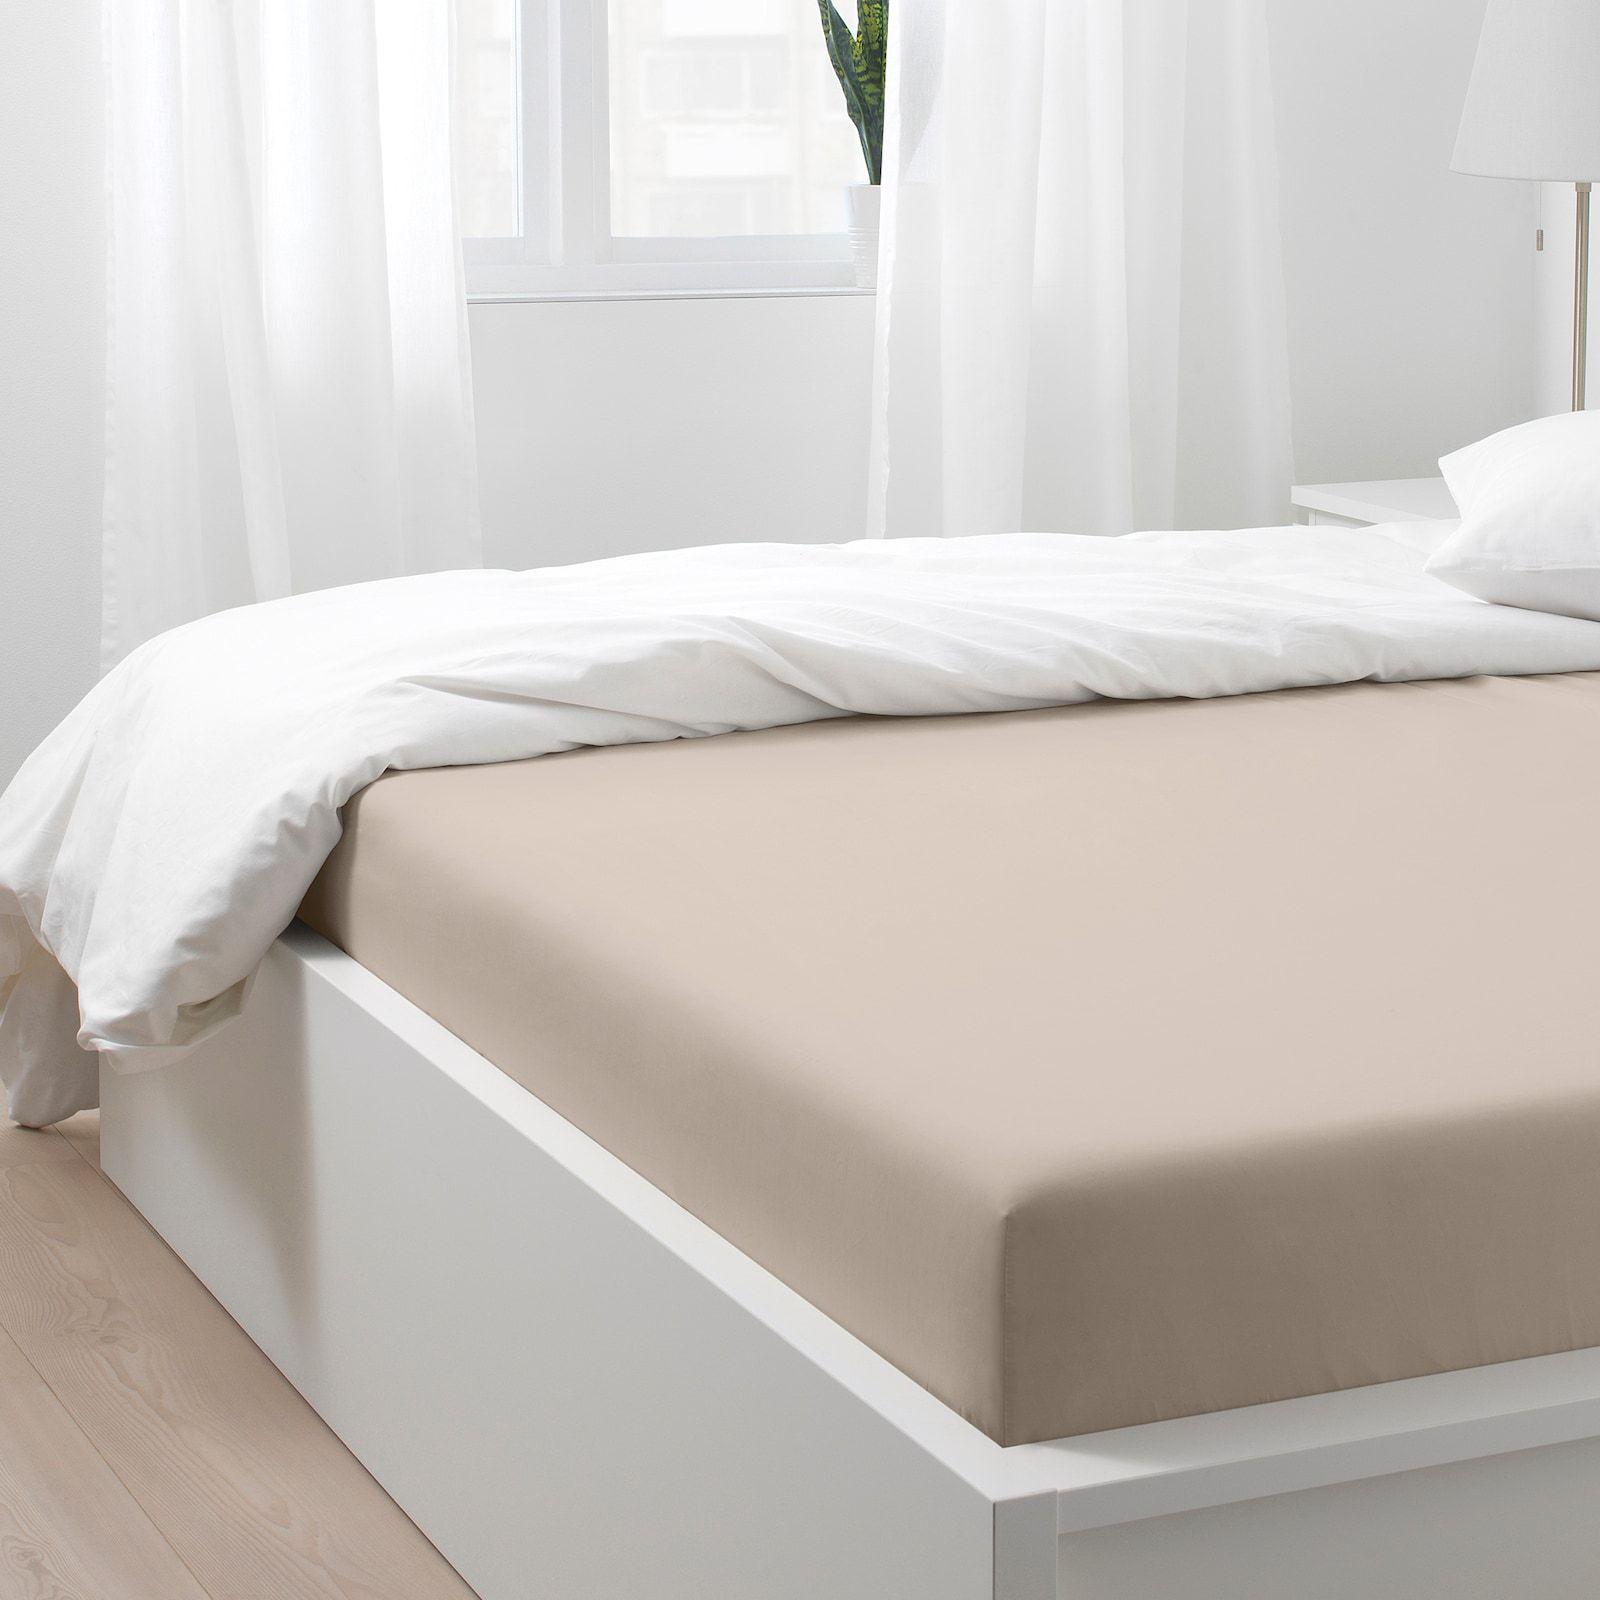 NATTJASMIN Fitted sheet, light beige, Queen IKEA in 2020